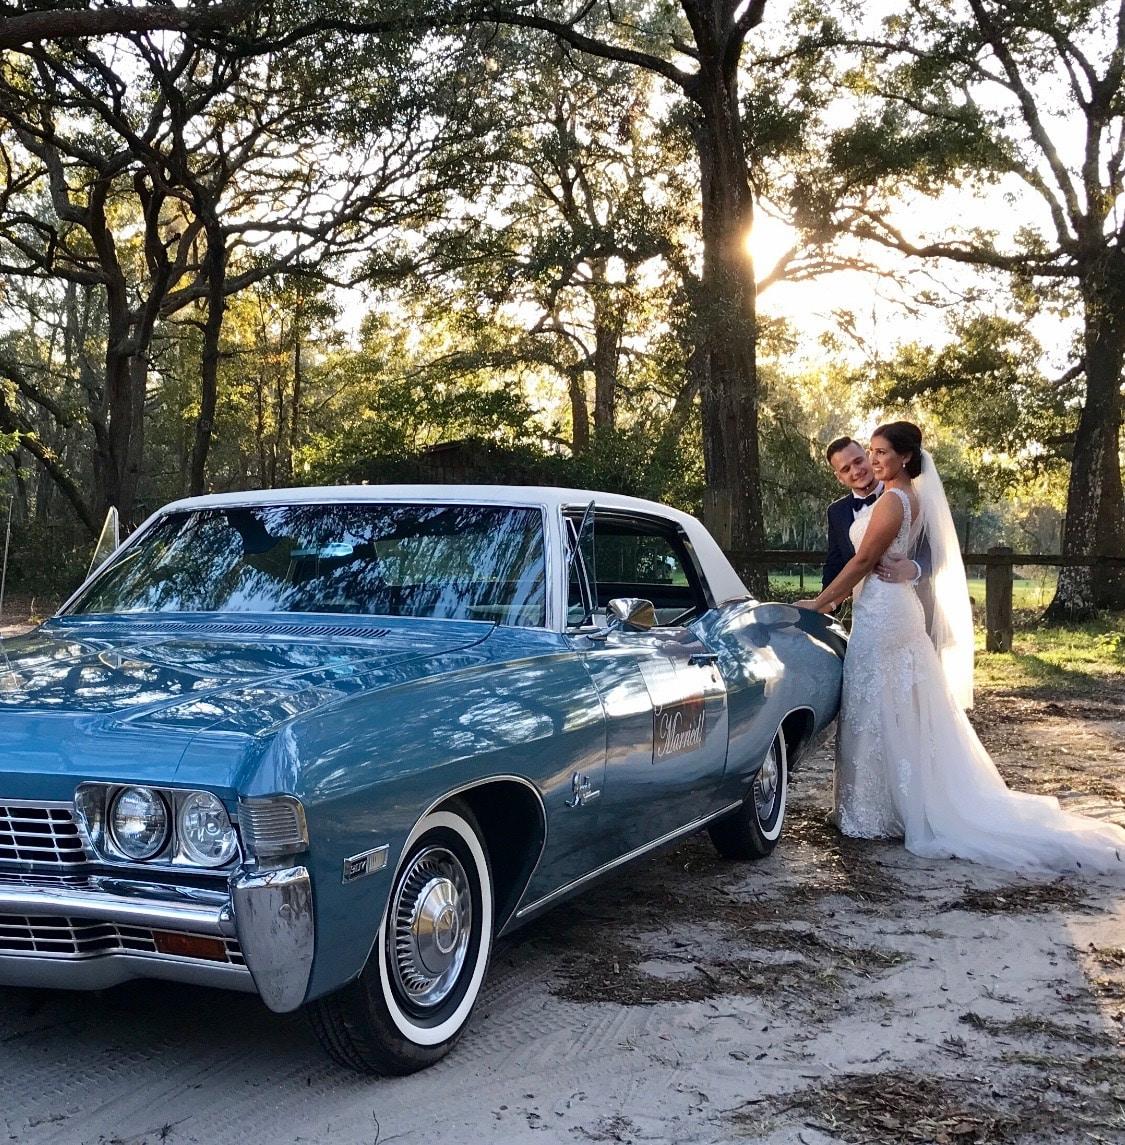 68 Chevy Impala Light Blue